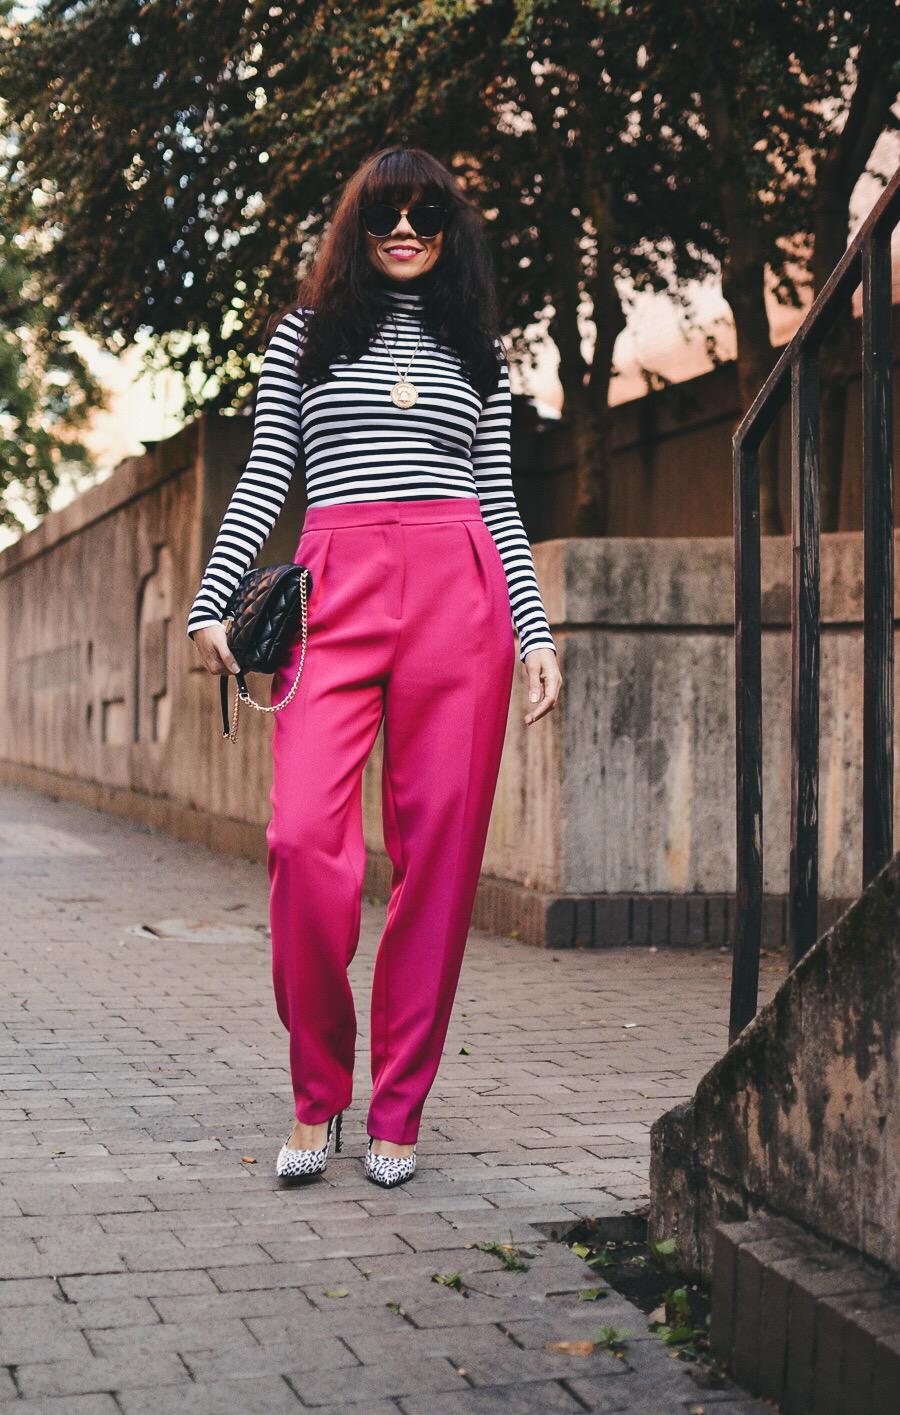 Peg pants street style